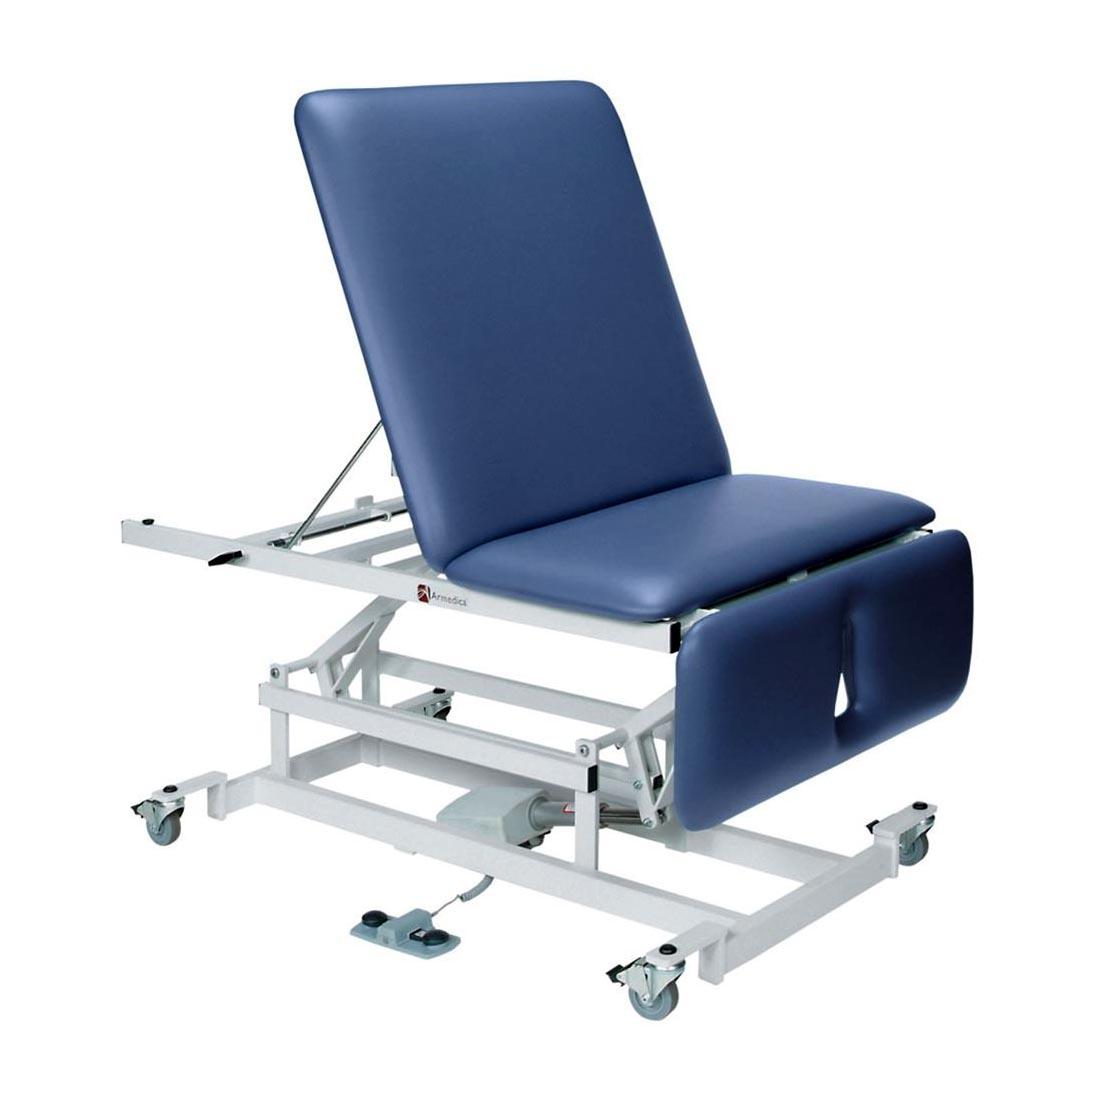 Armedica AM-368 treatment table